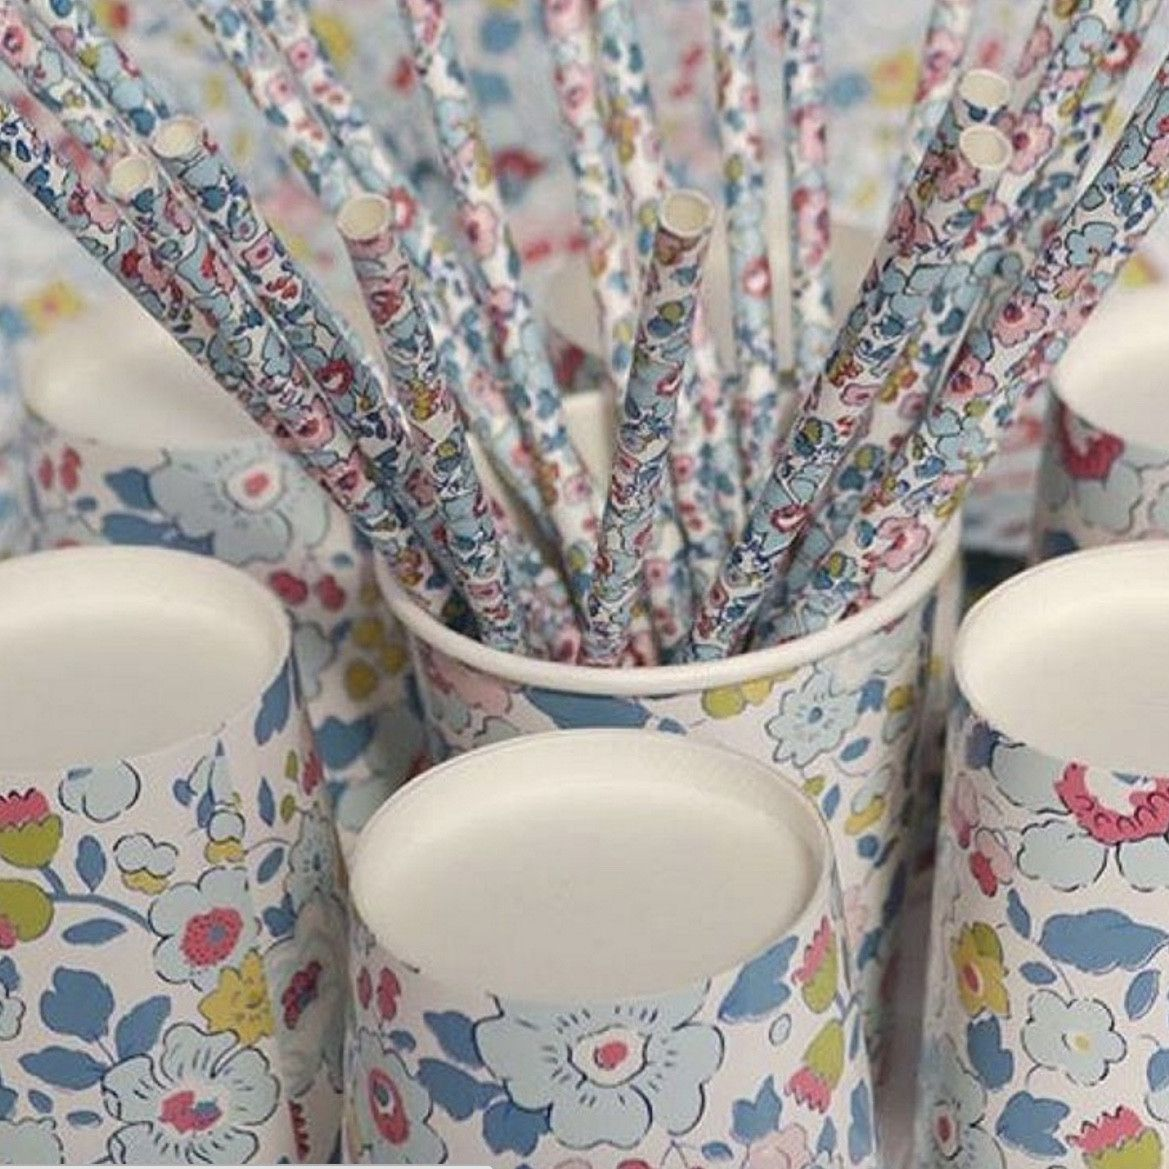 Meri Meri Liberty Betsy Paper Straws Party Supplies Meri Meri Uk Putti Fine Furnishings Toronto Canada 2 Cuisine